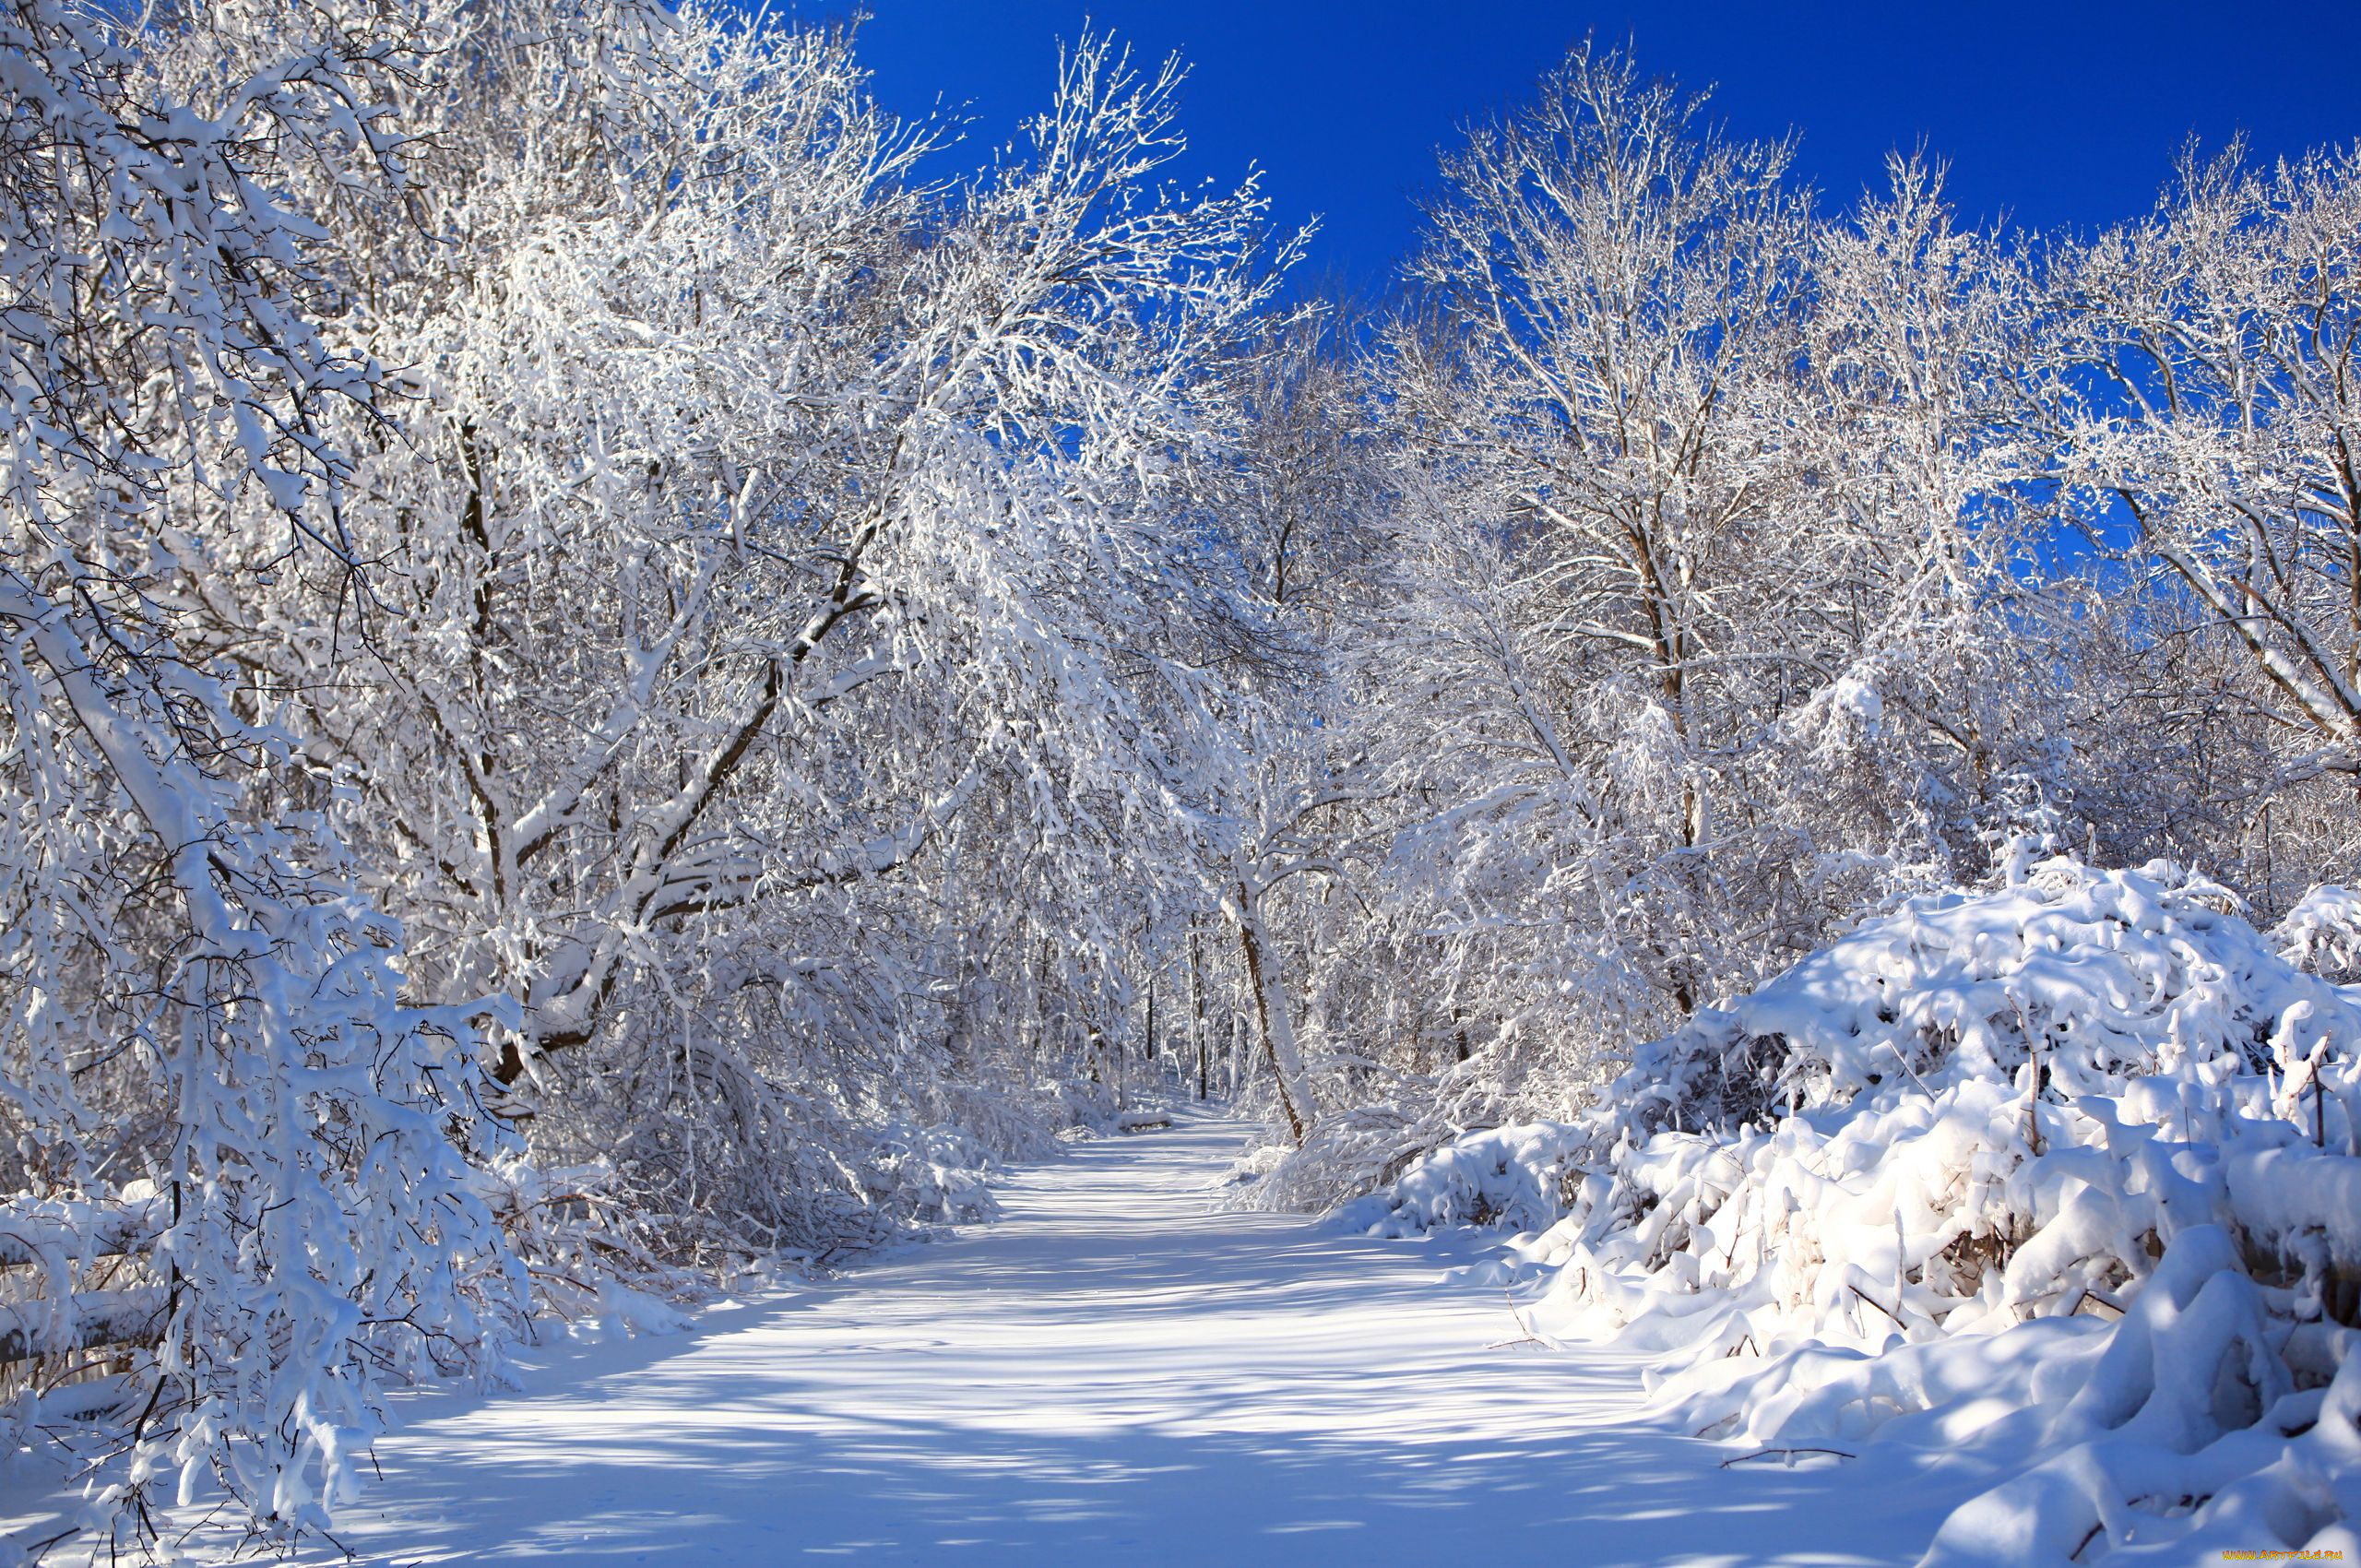 Обои На Тему Зима На Рабочий Стол